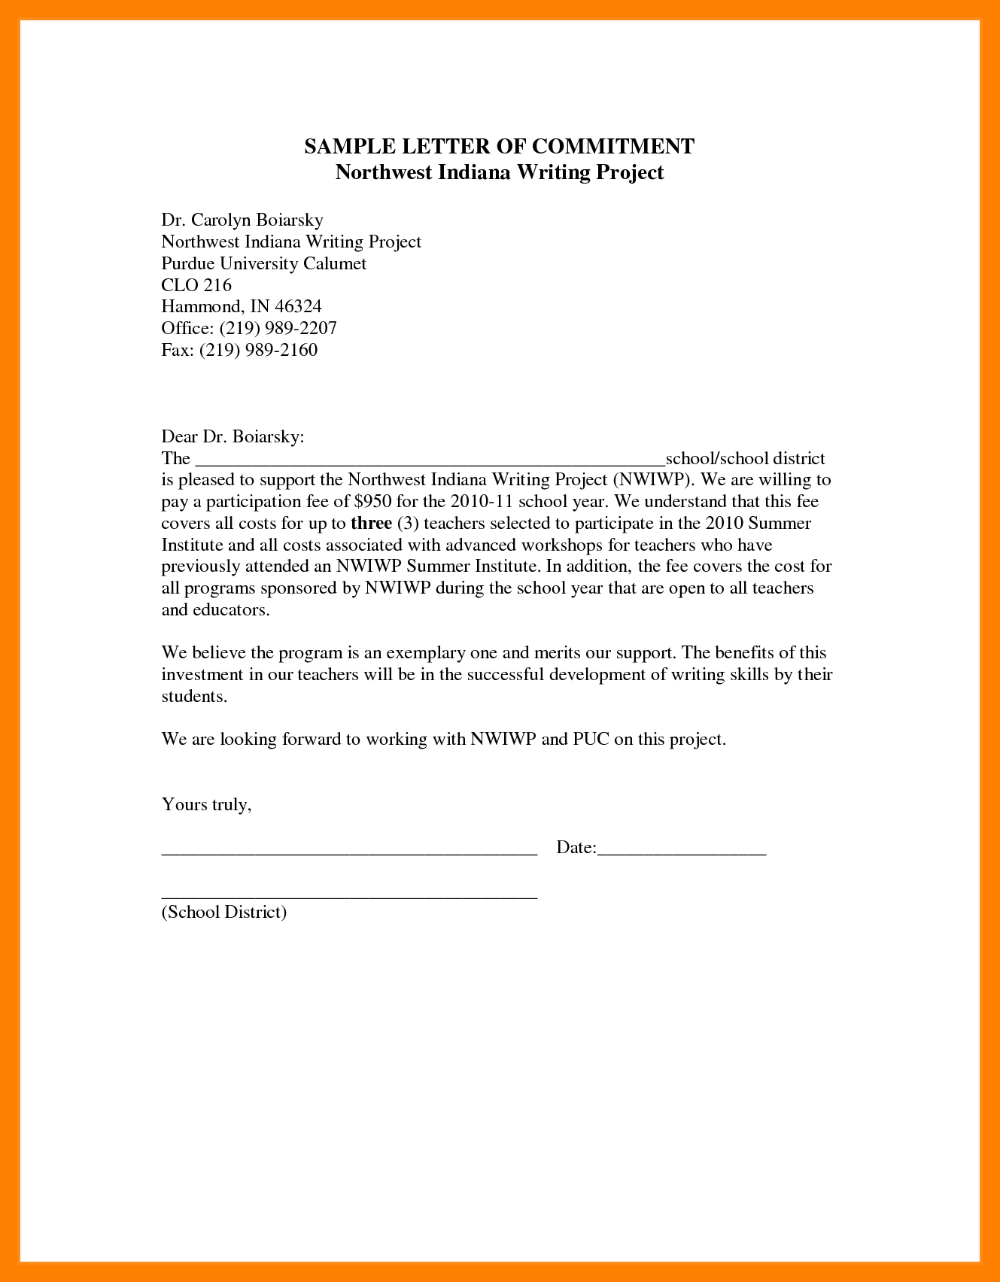 fresh commintment letter sample for you letterbuis in objective resume students stock associate job description career medical assistant